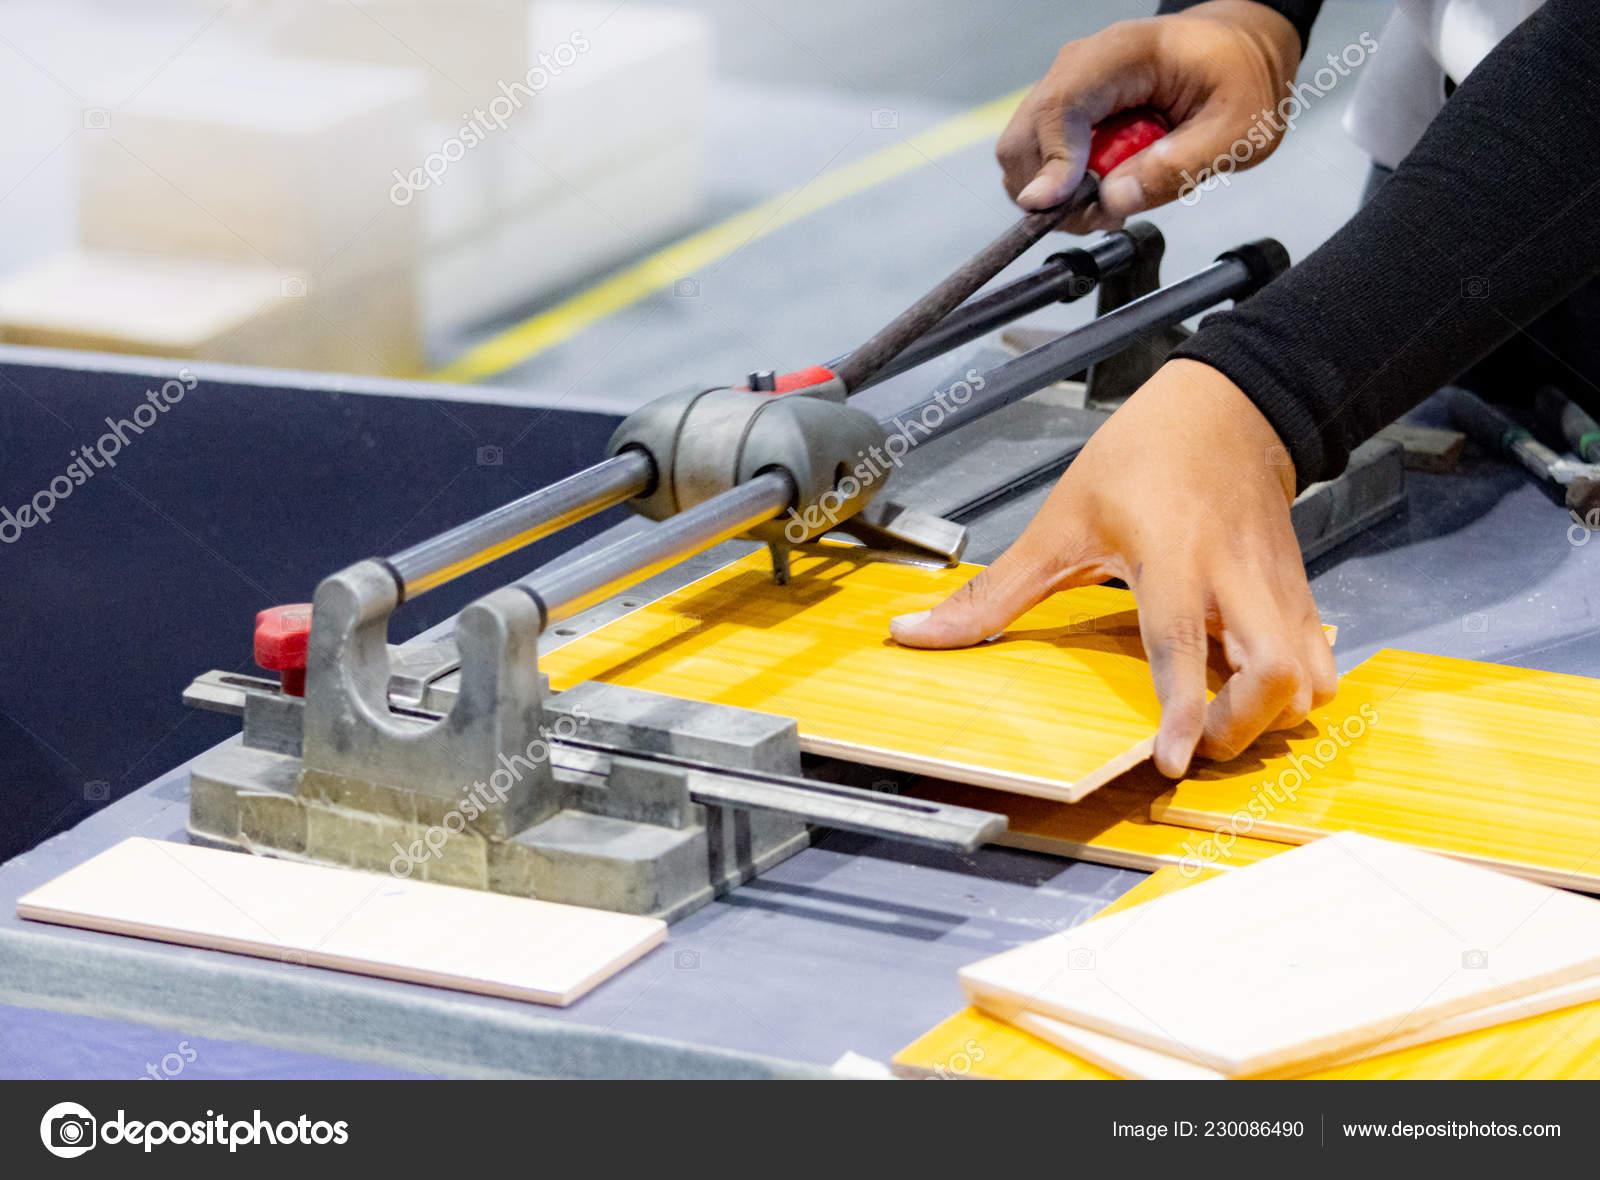 cutting floor tiles using tile cutter machine cutting ceramic tiles stock photo image by c prarinya 230086490